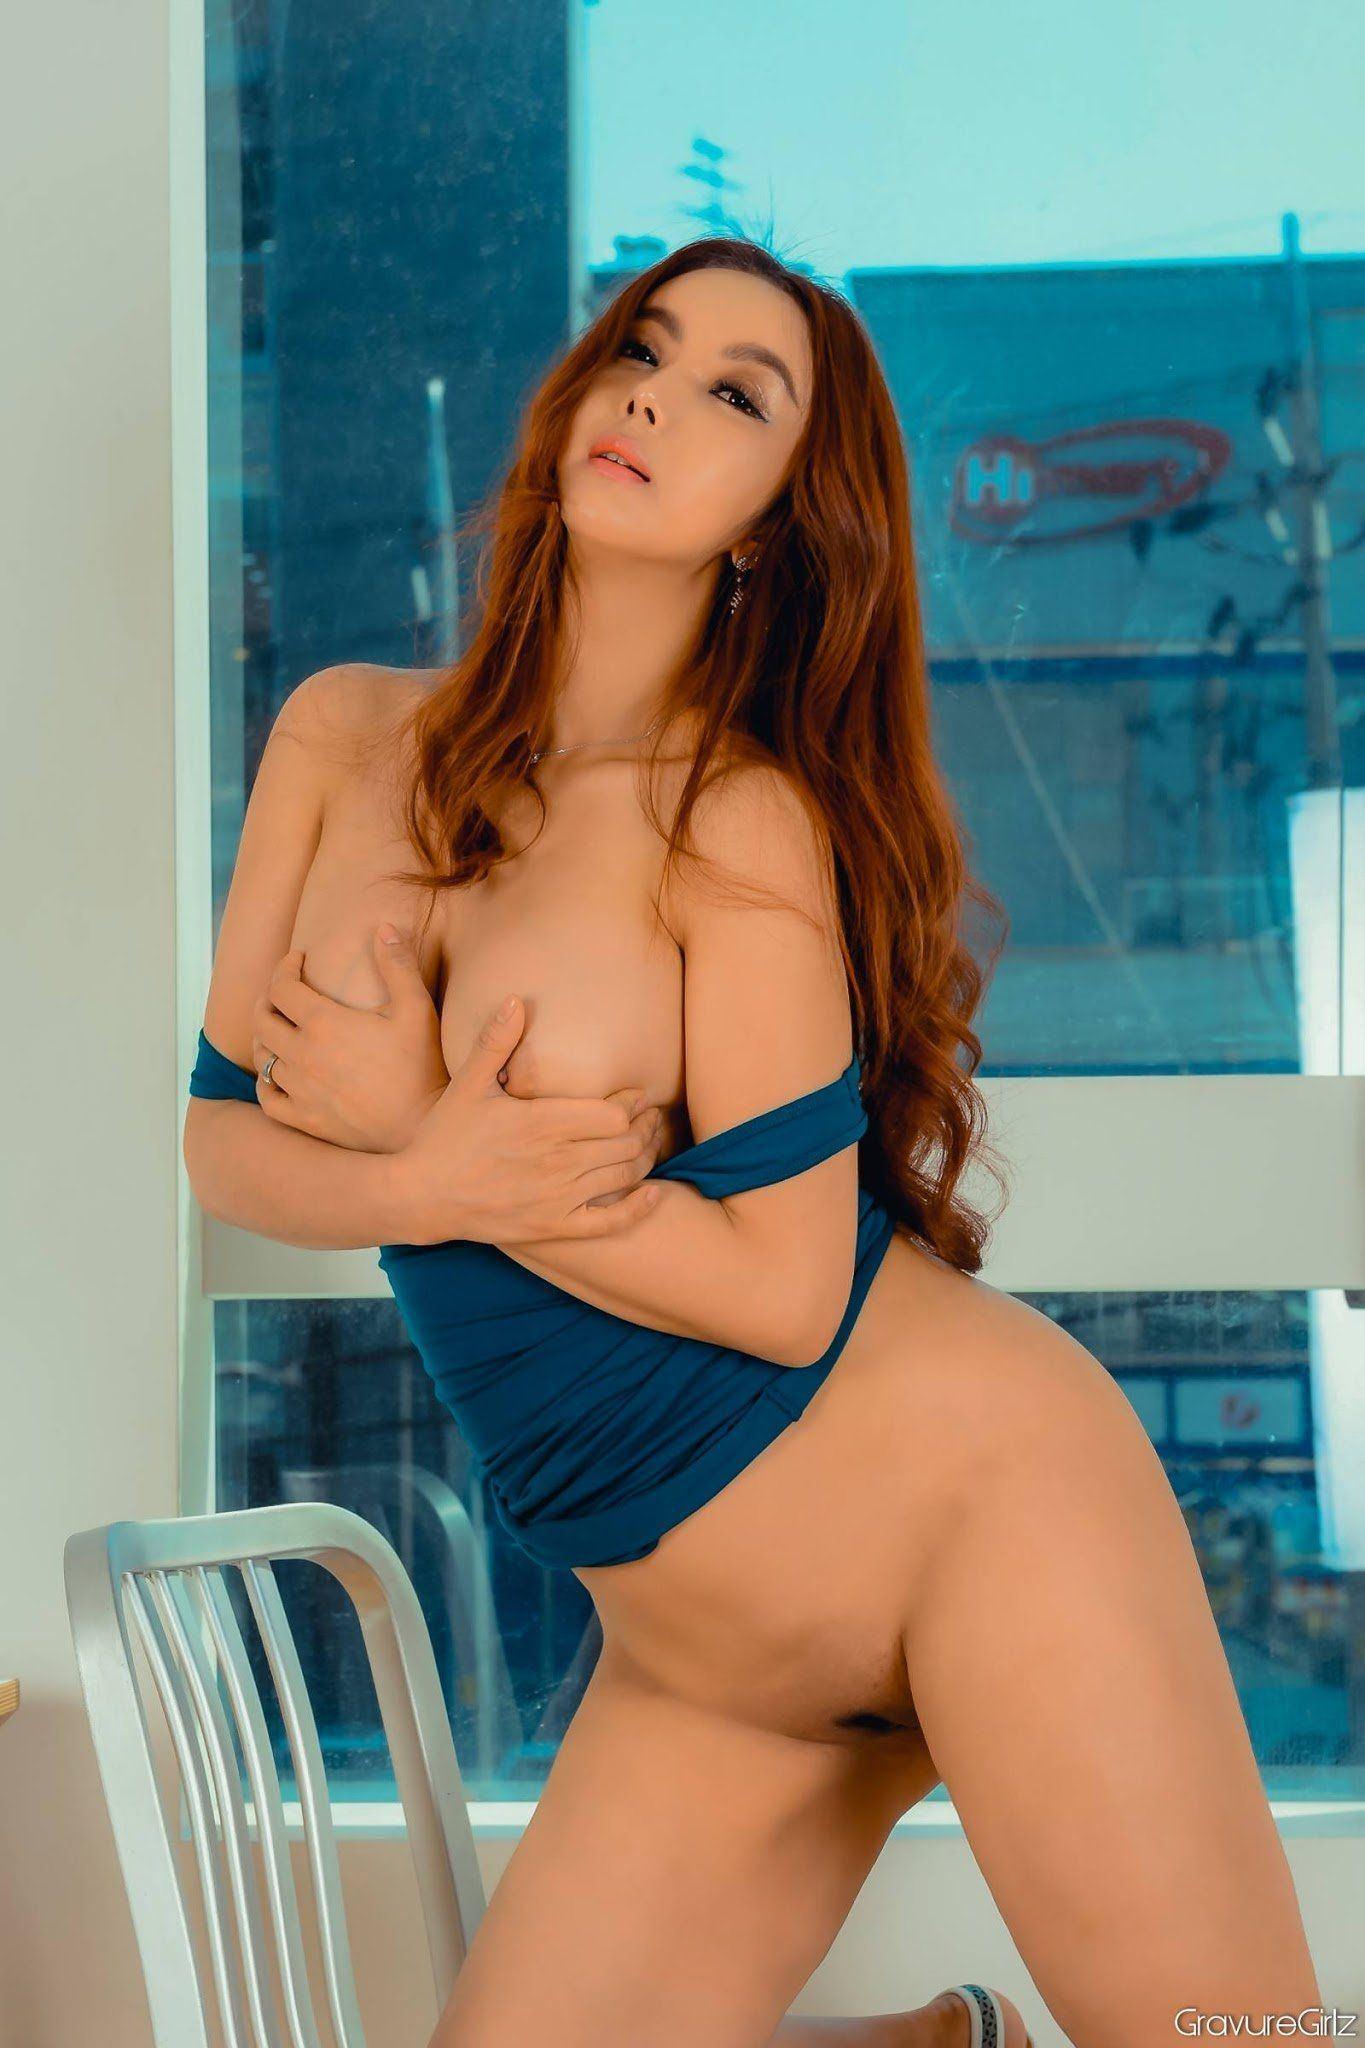 Korean girl model nude